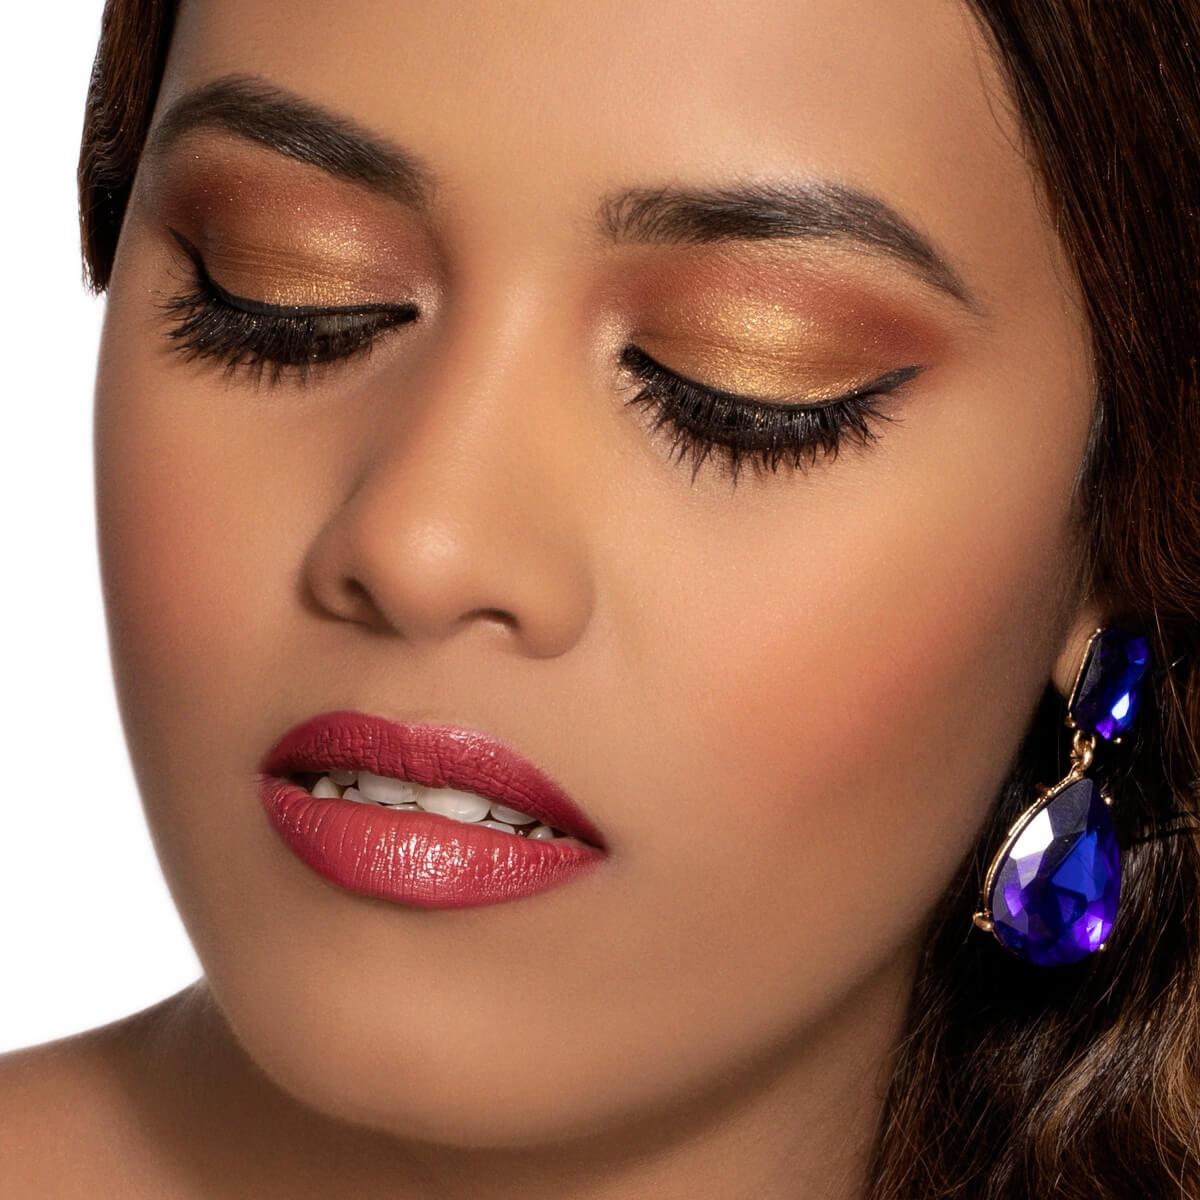 jasmine-from-aladdin